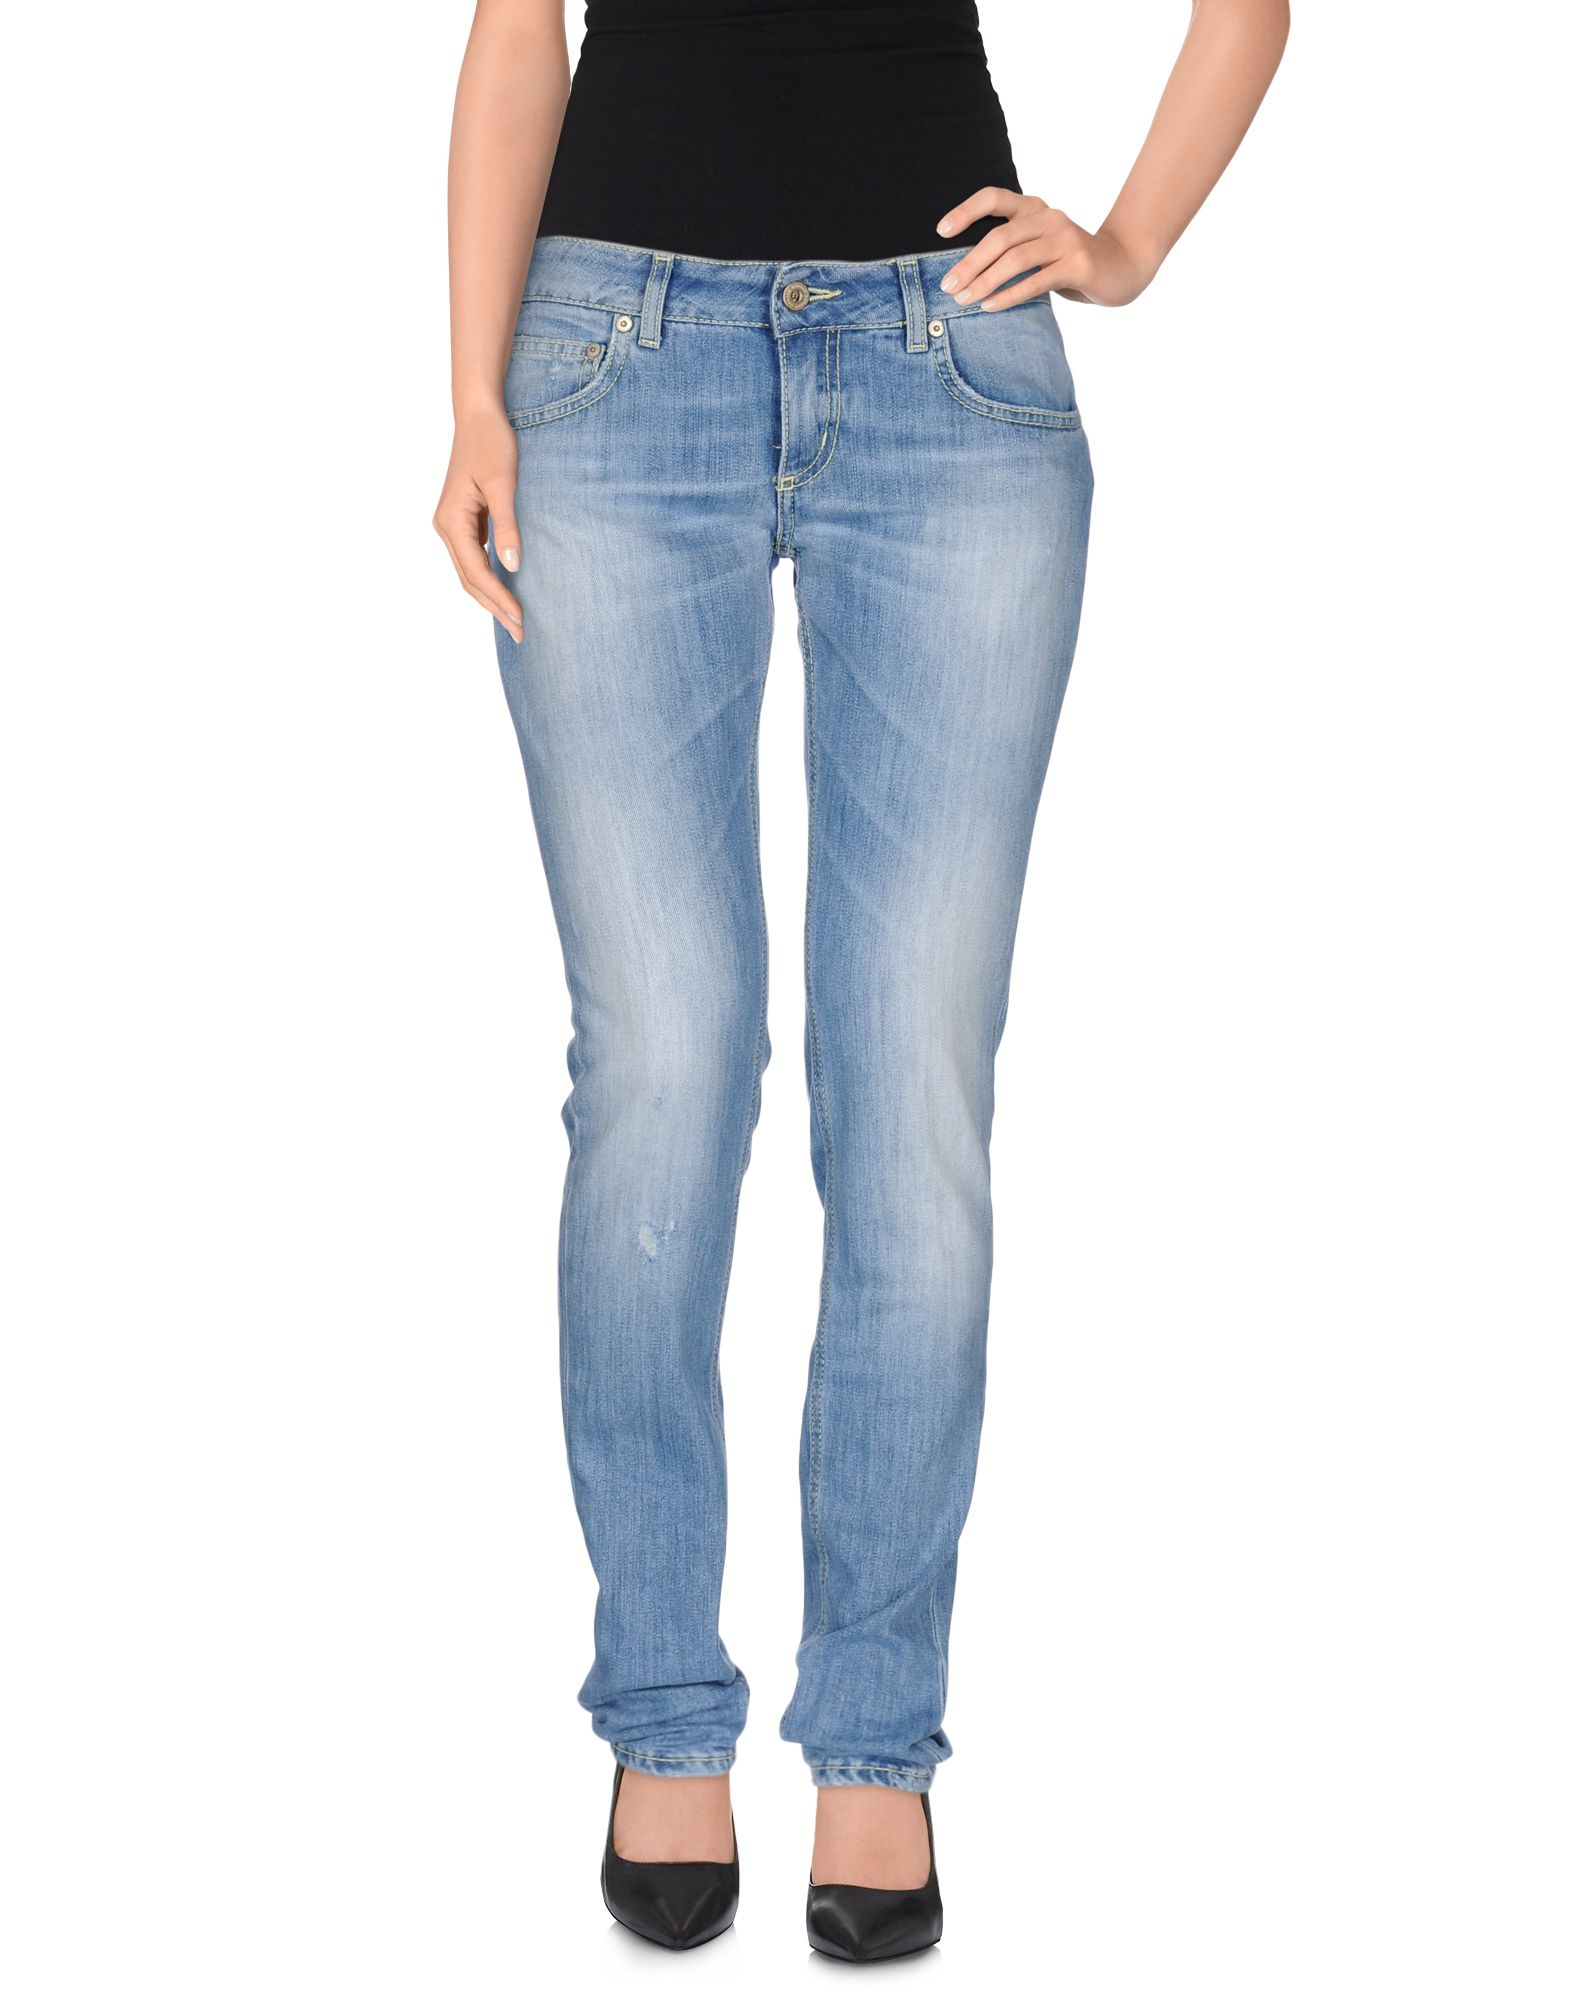 Pantaloni Jeans Dondup Donna - Acquista online su aPHVMU7Vu